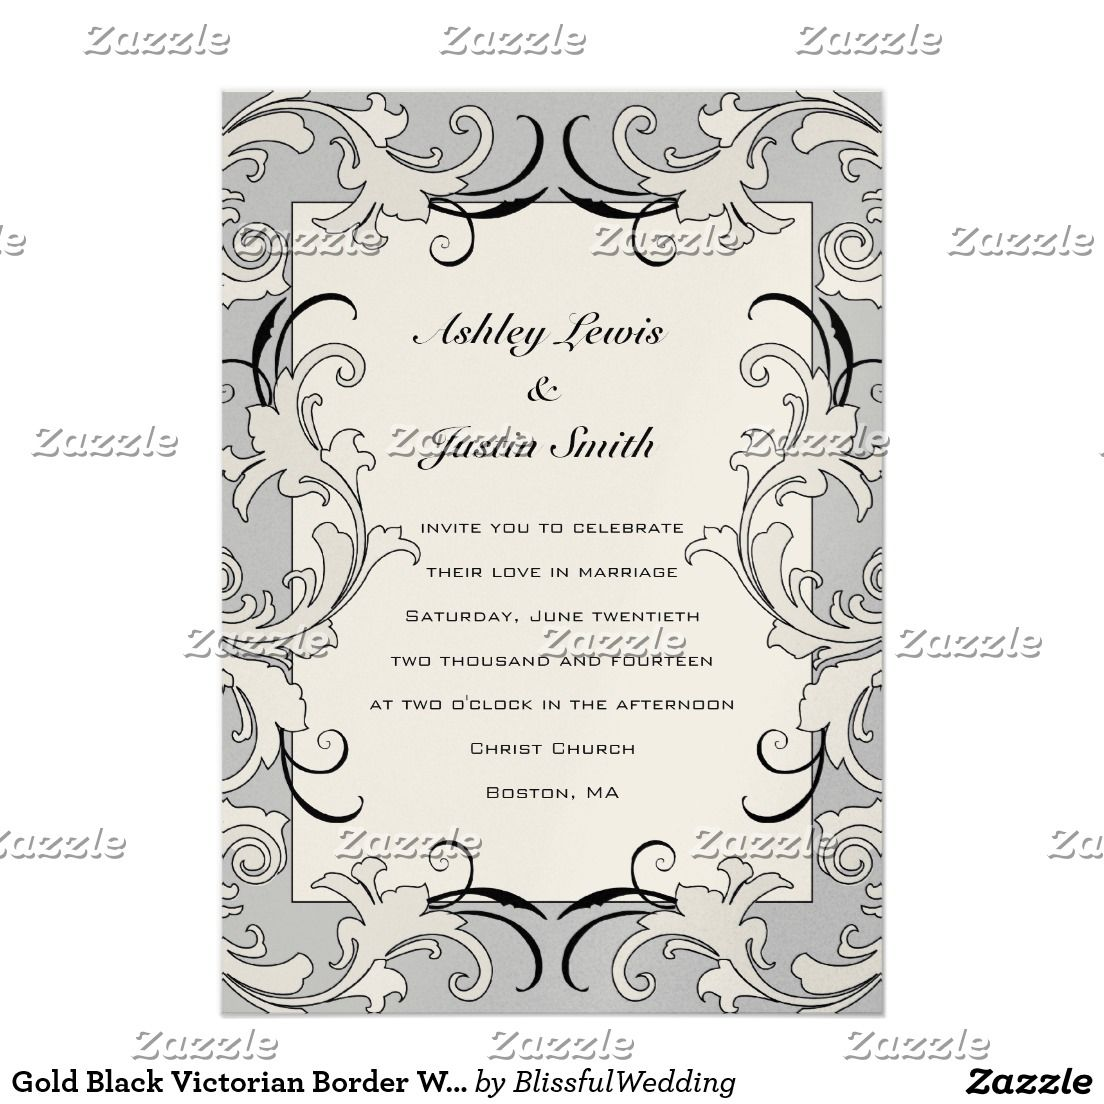 Gold Black Victorian Border Wedding Invitation Steampunk Wedding Invitation Modern Wedding Invitation Wording Wedding Invitation Templates